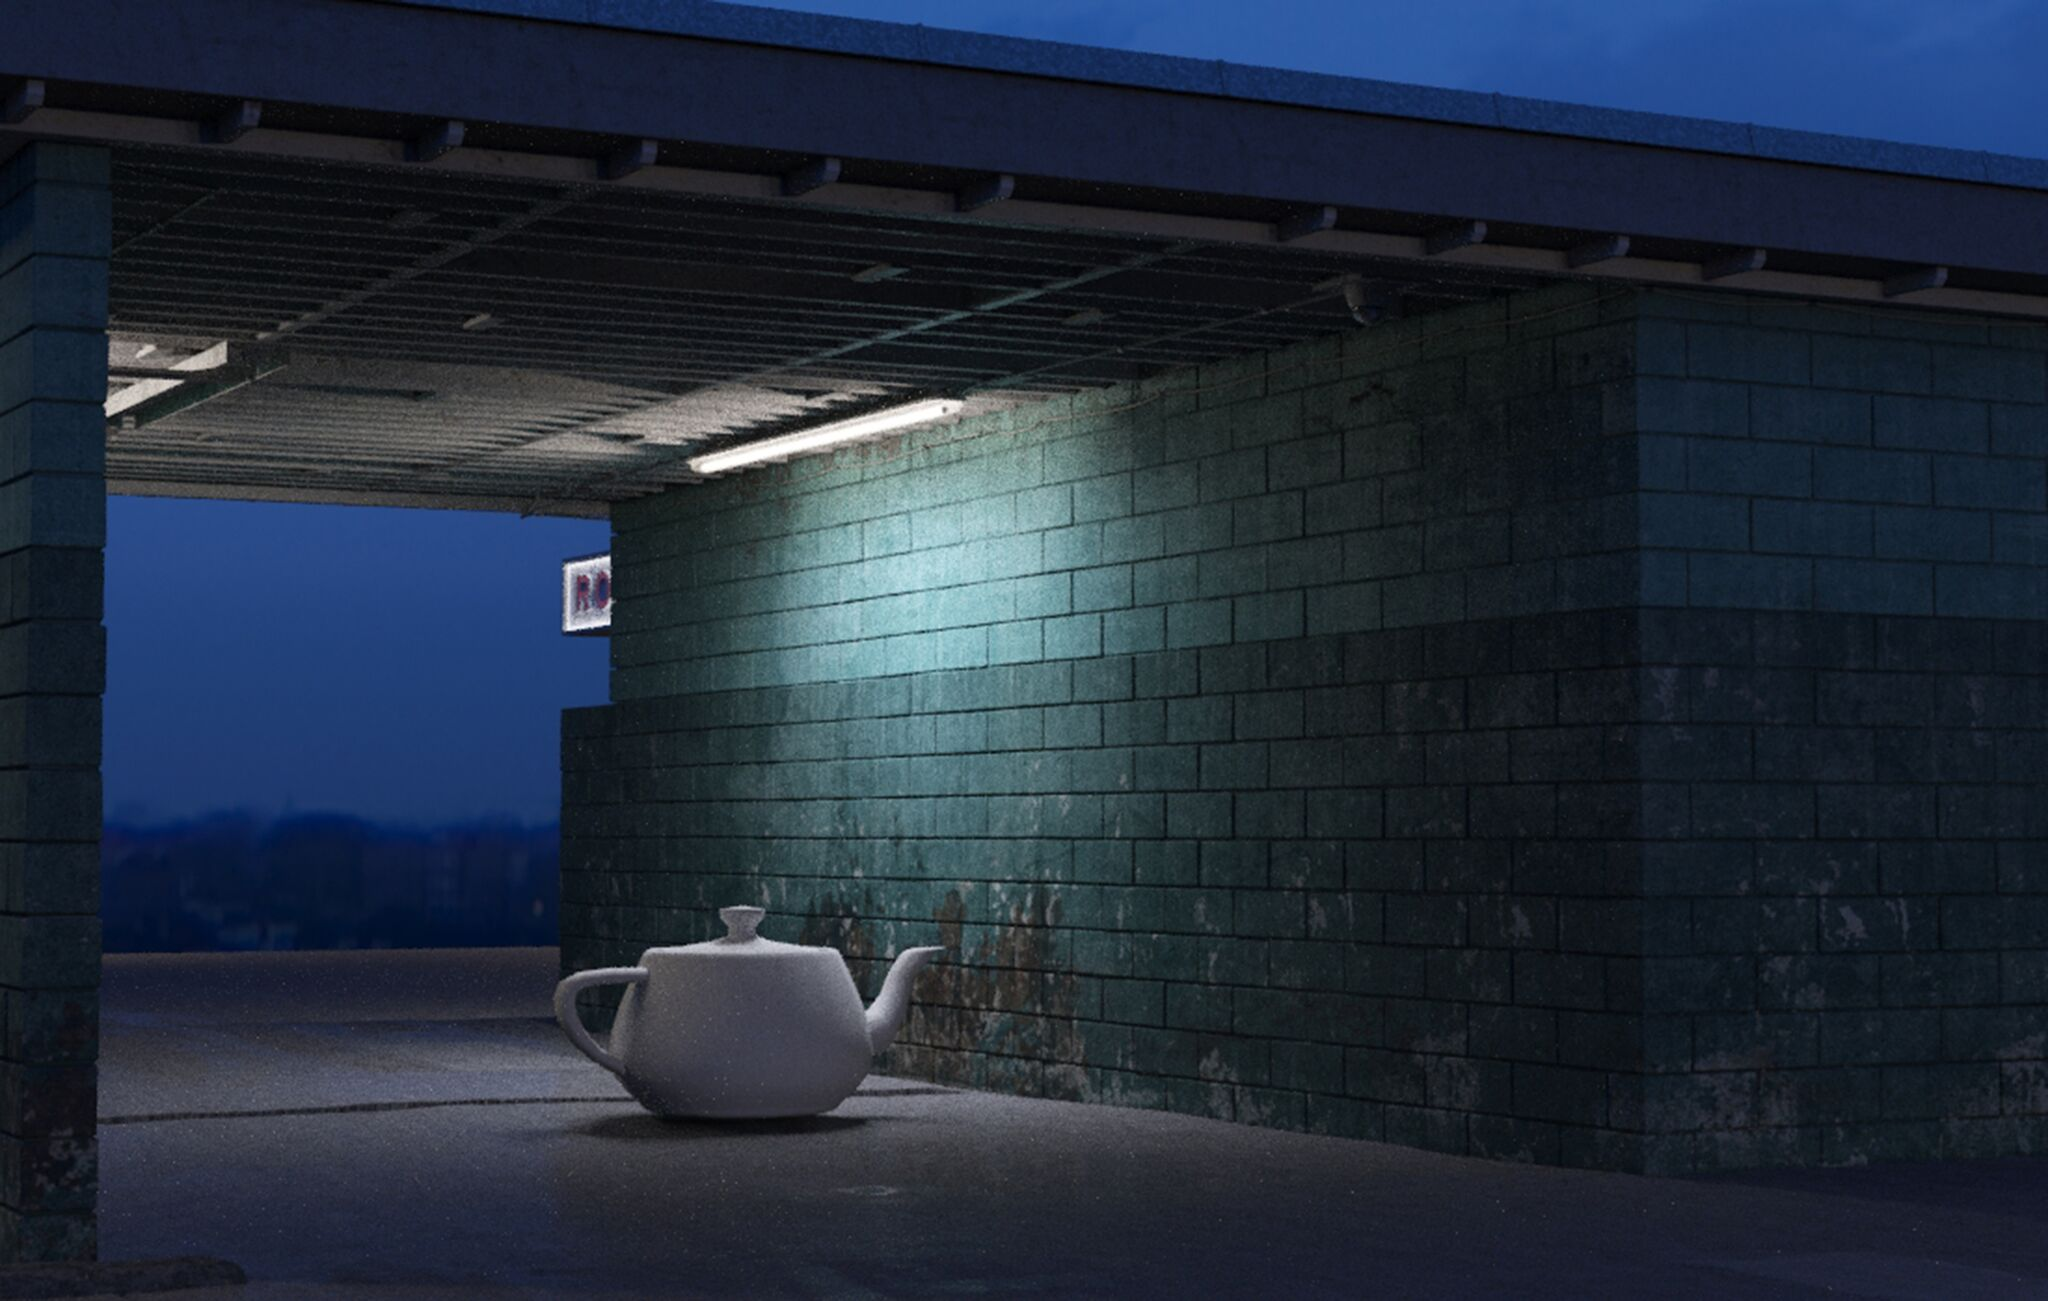 Narek Gabazyan Lonely in the night